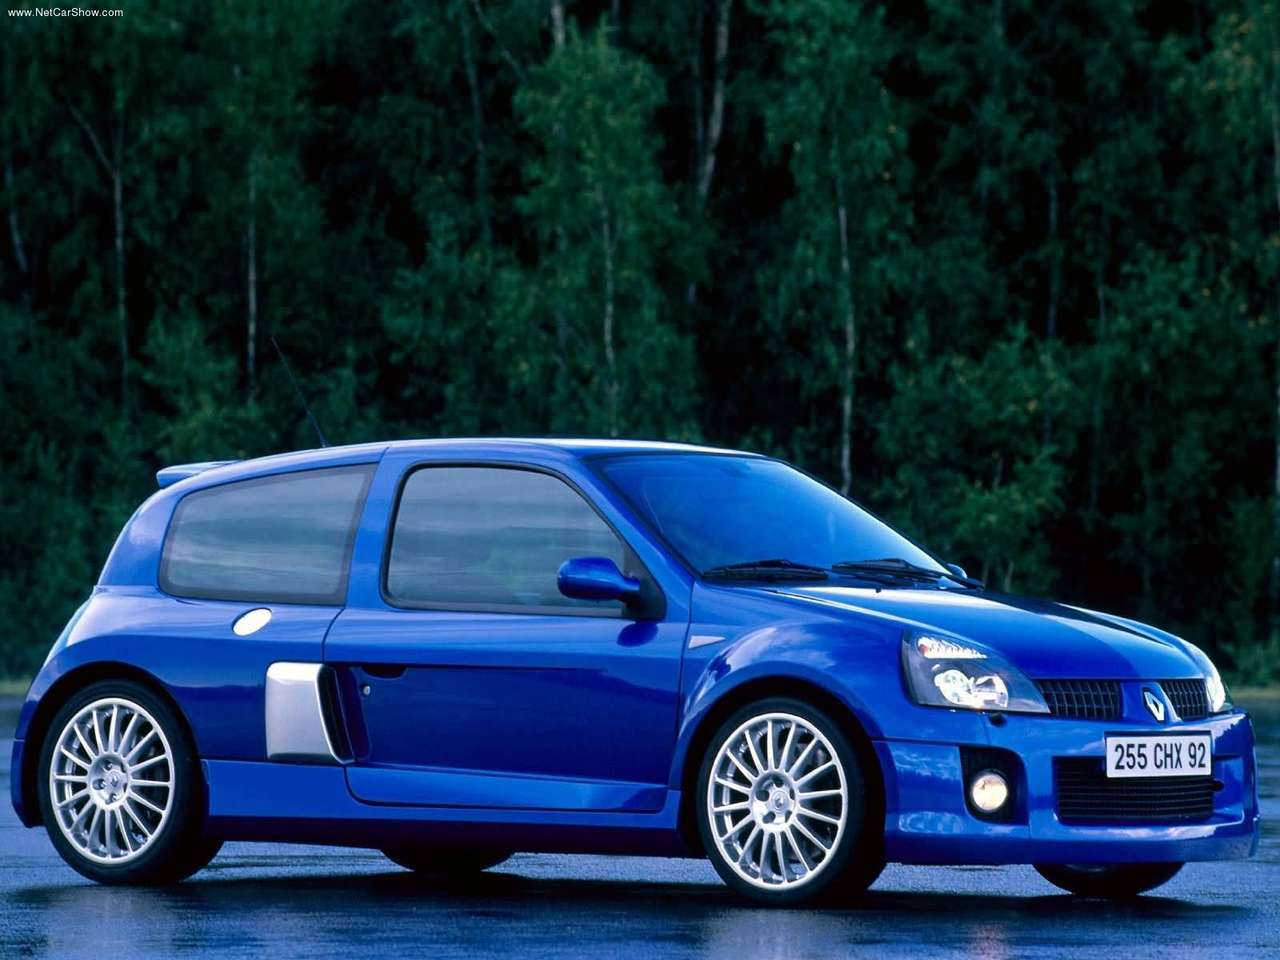 renault-clio_v6_renault_sport-2003-1280-07.jpg